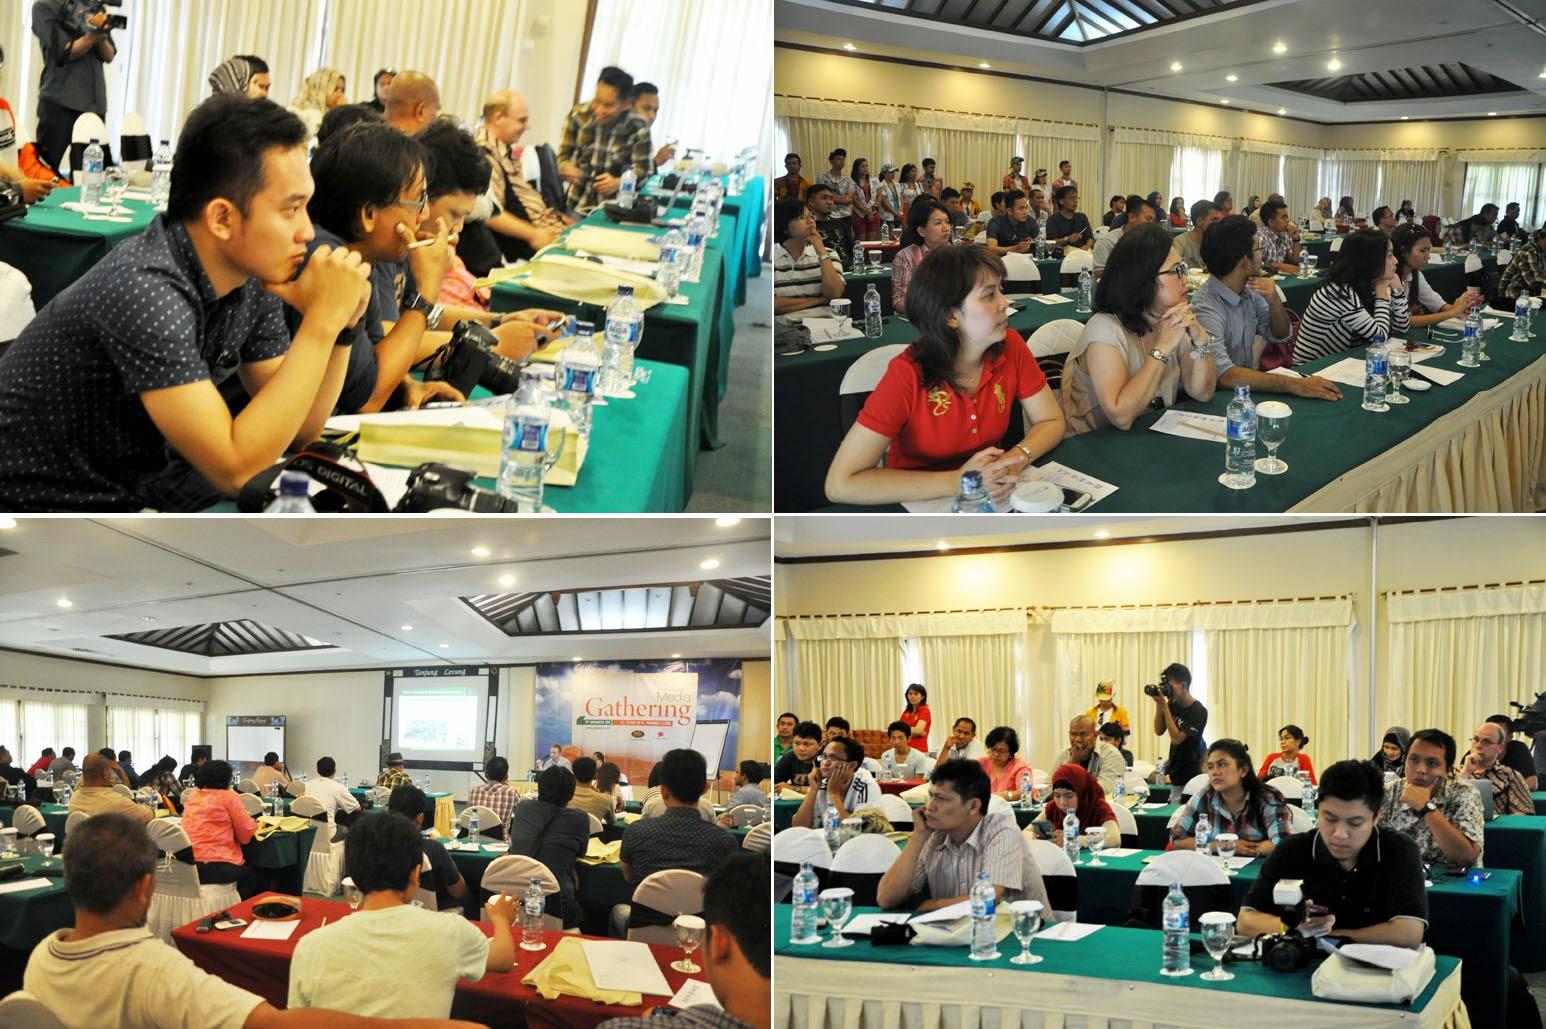 EO Outing Outbound Gathering di Lembang, Bandung, Jakarta, Bogor, Jogyakarta, Tanjung Lesung